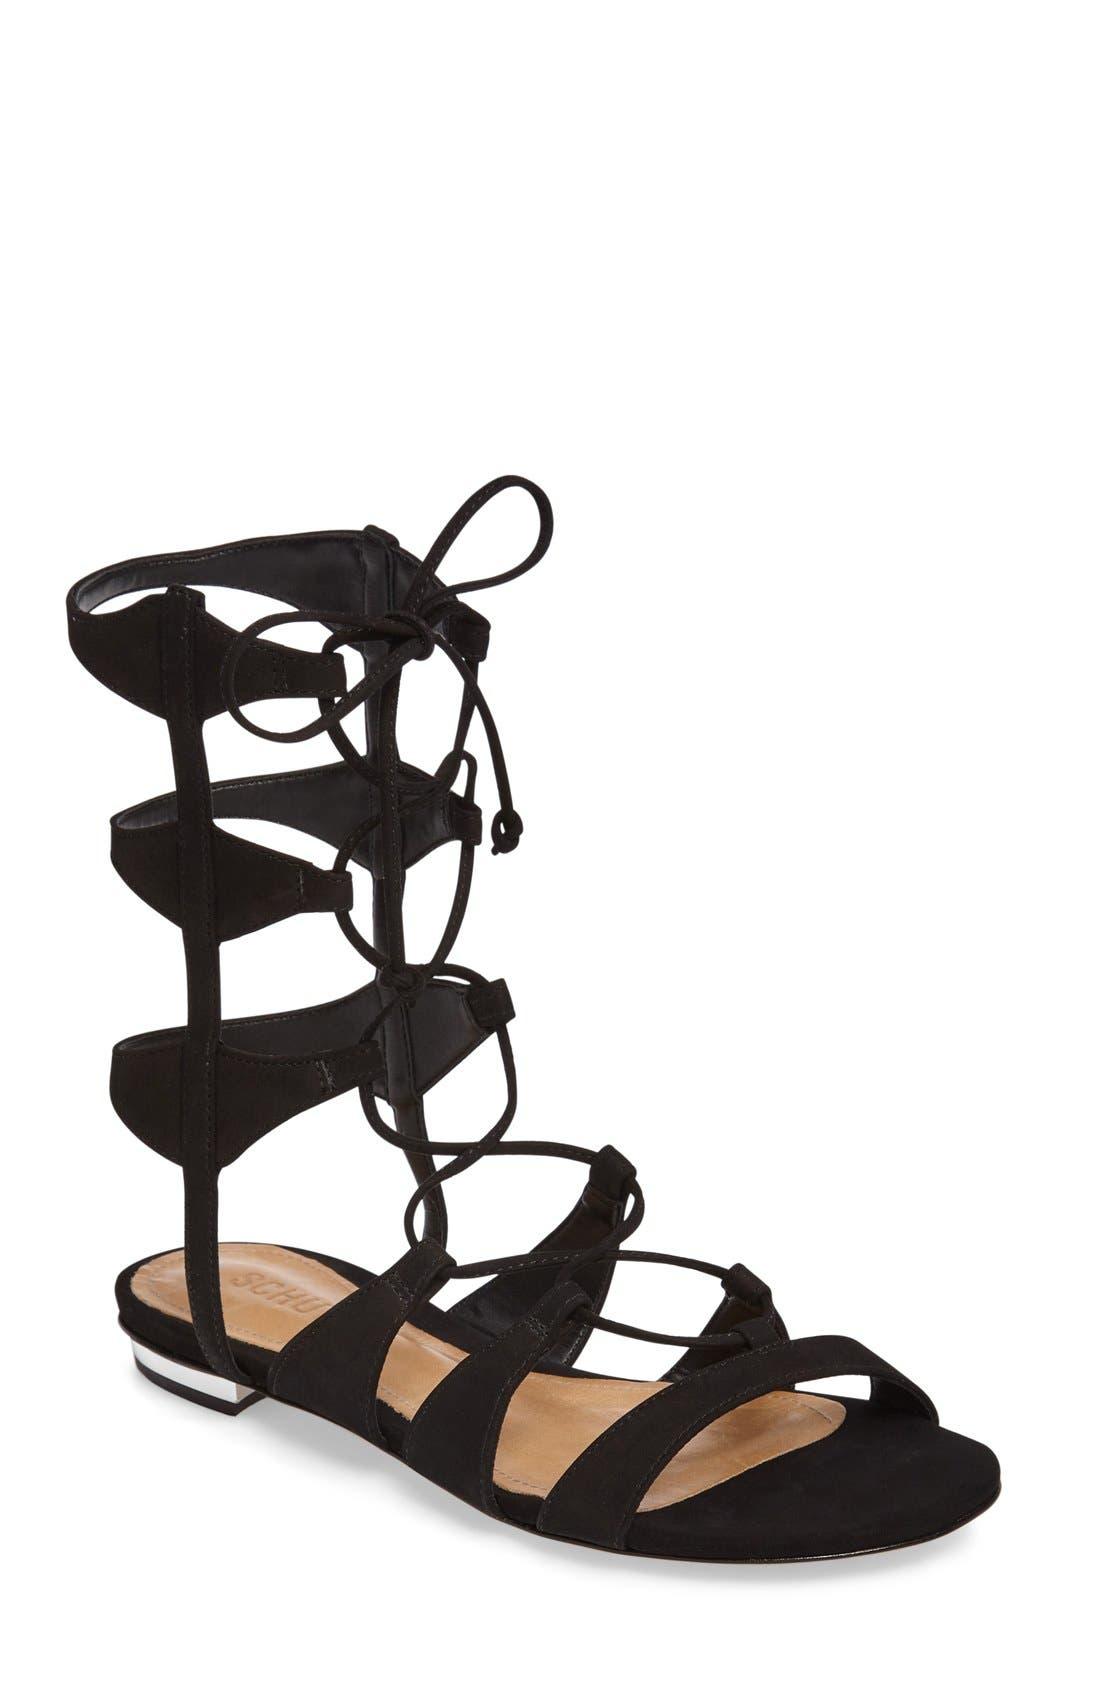 Erlina Lace-Up Sandal,                             Main thumbnail 1, color,                             004